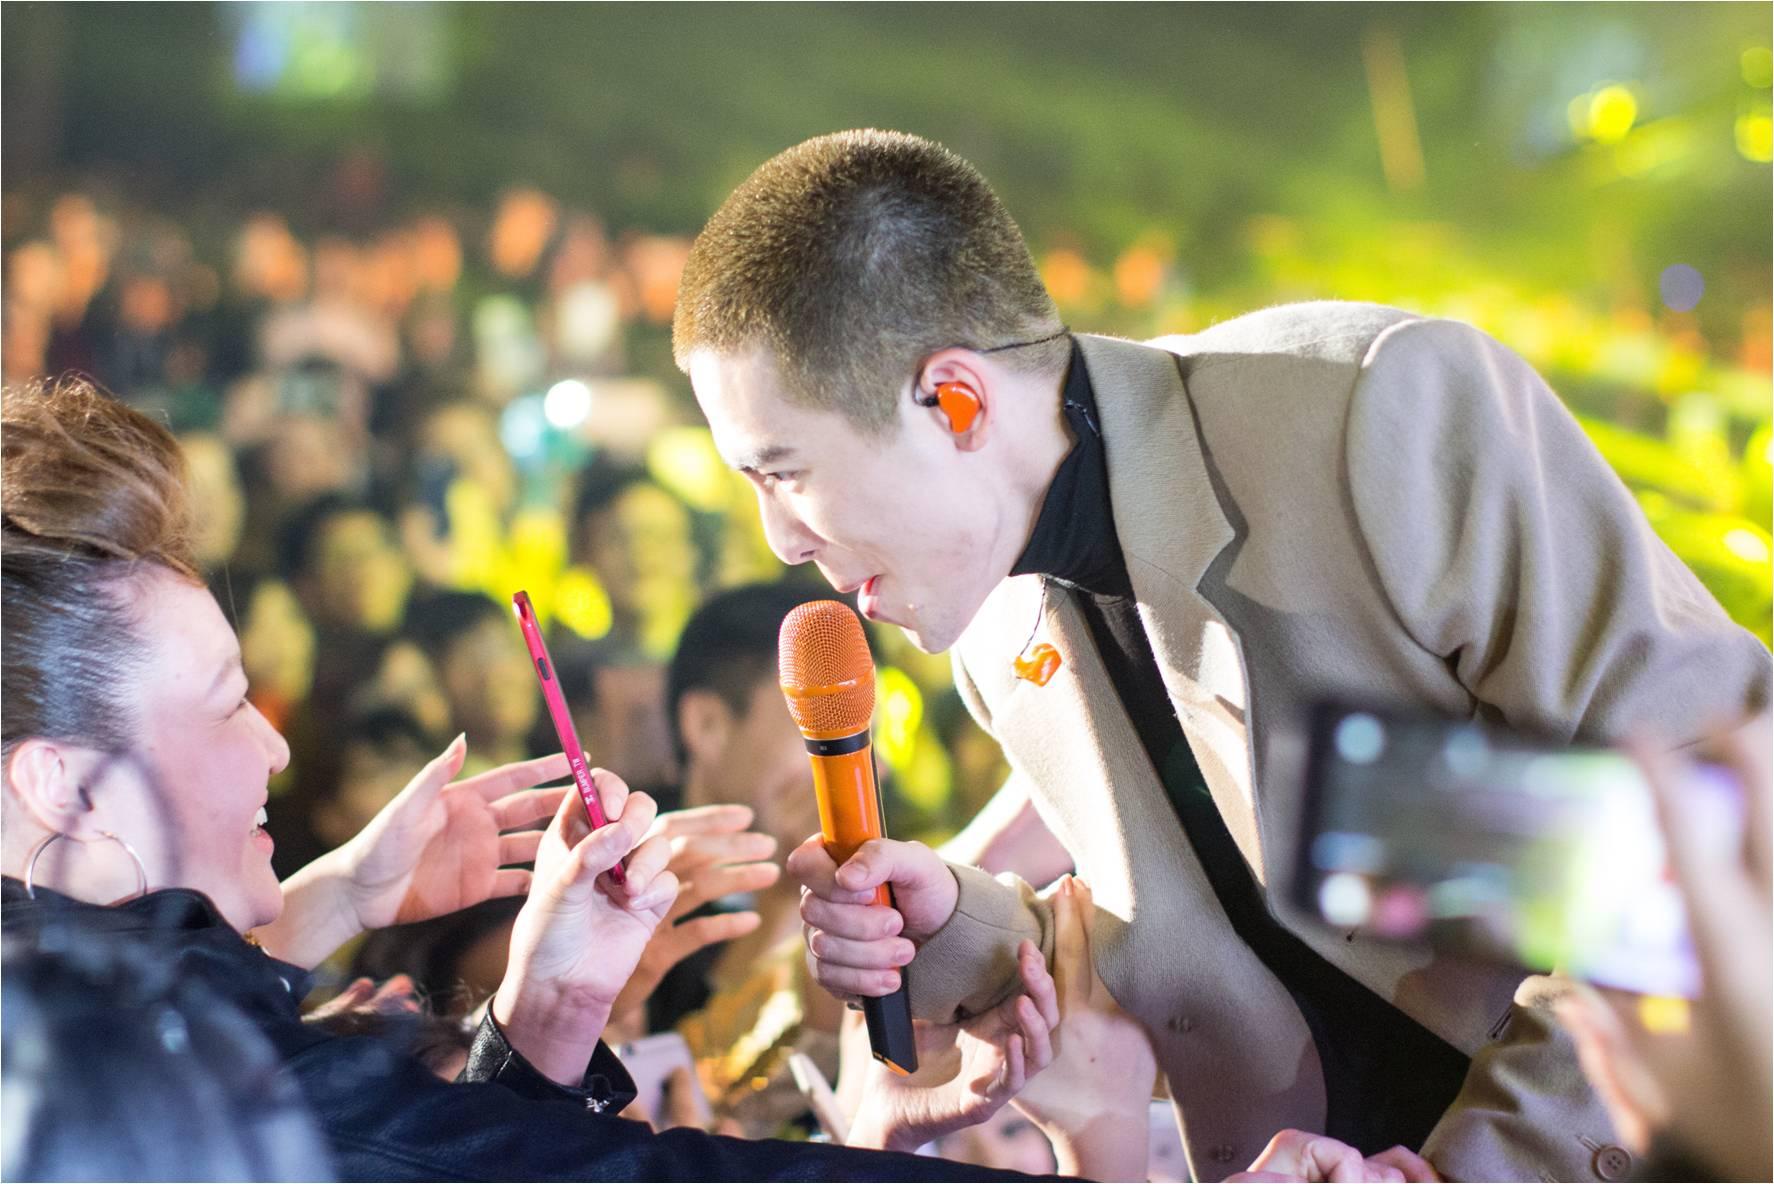 04.iTutorGroup集團邀請國際巨星蕭敬騰熱力開唱-1